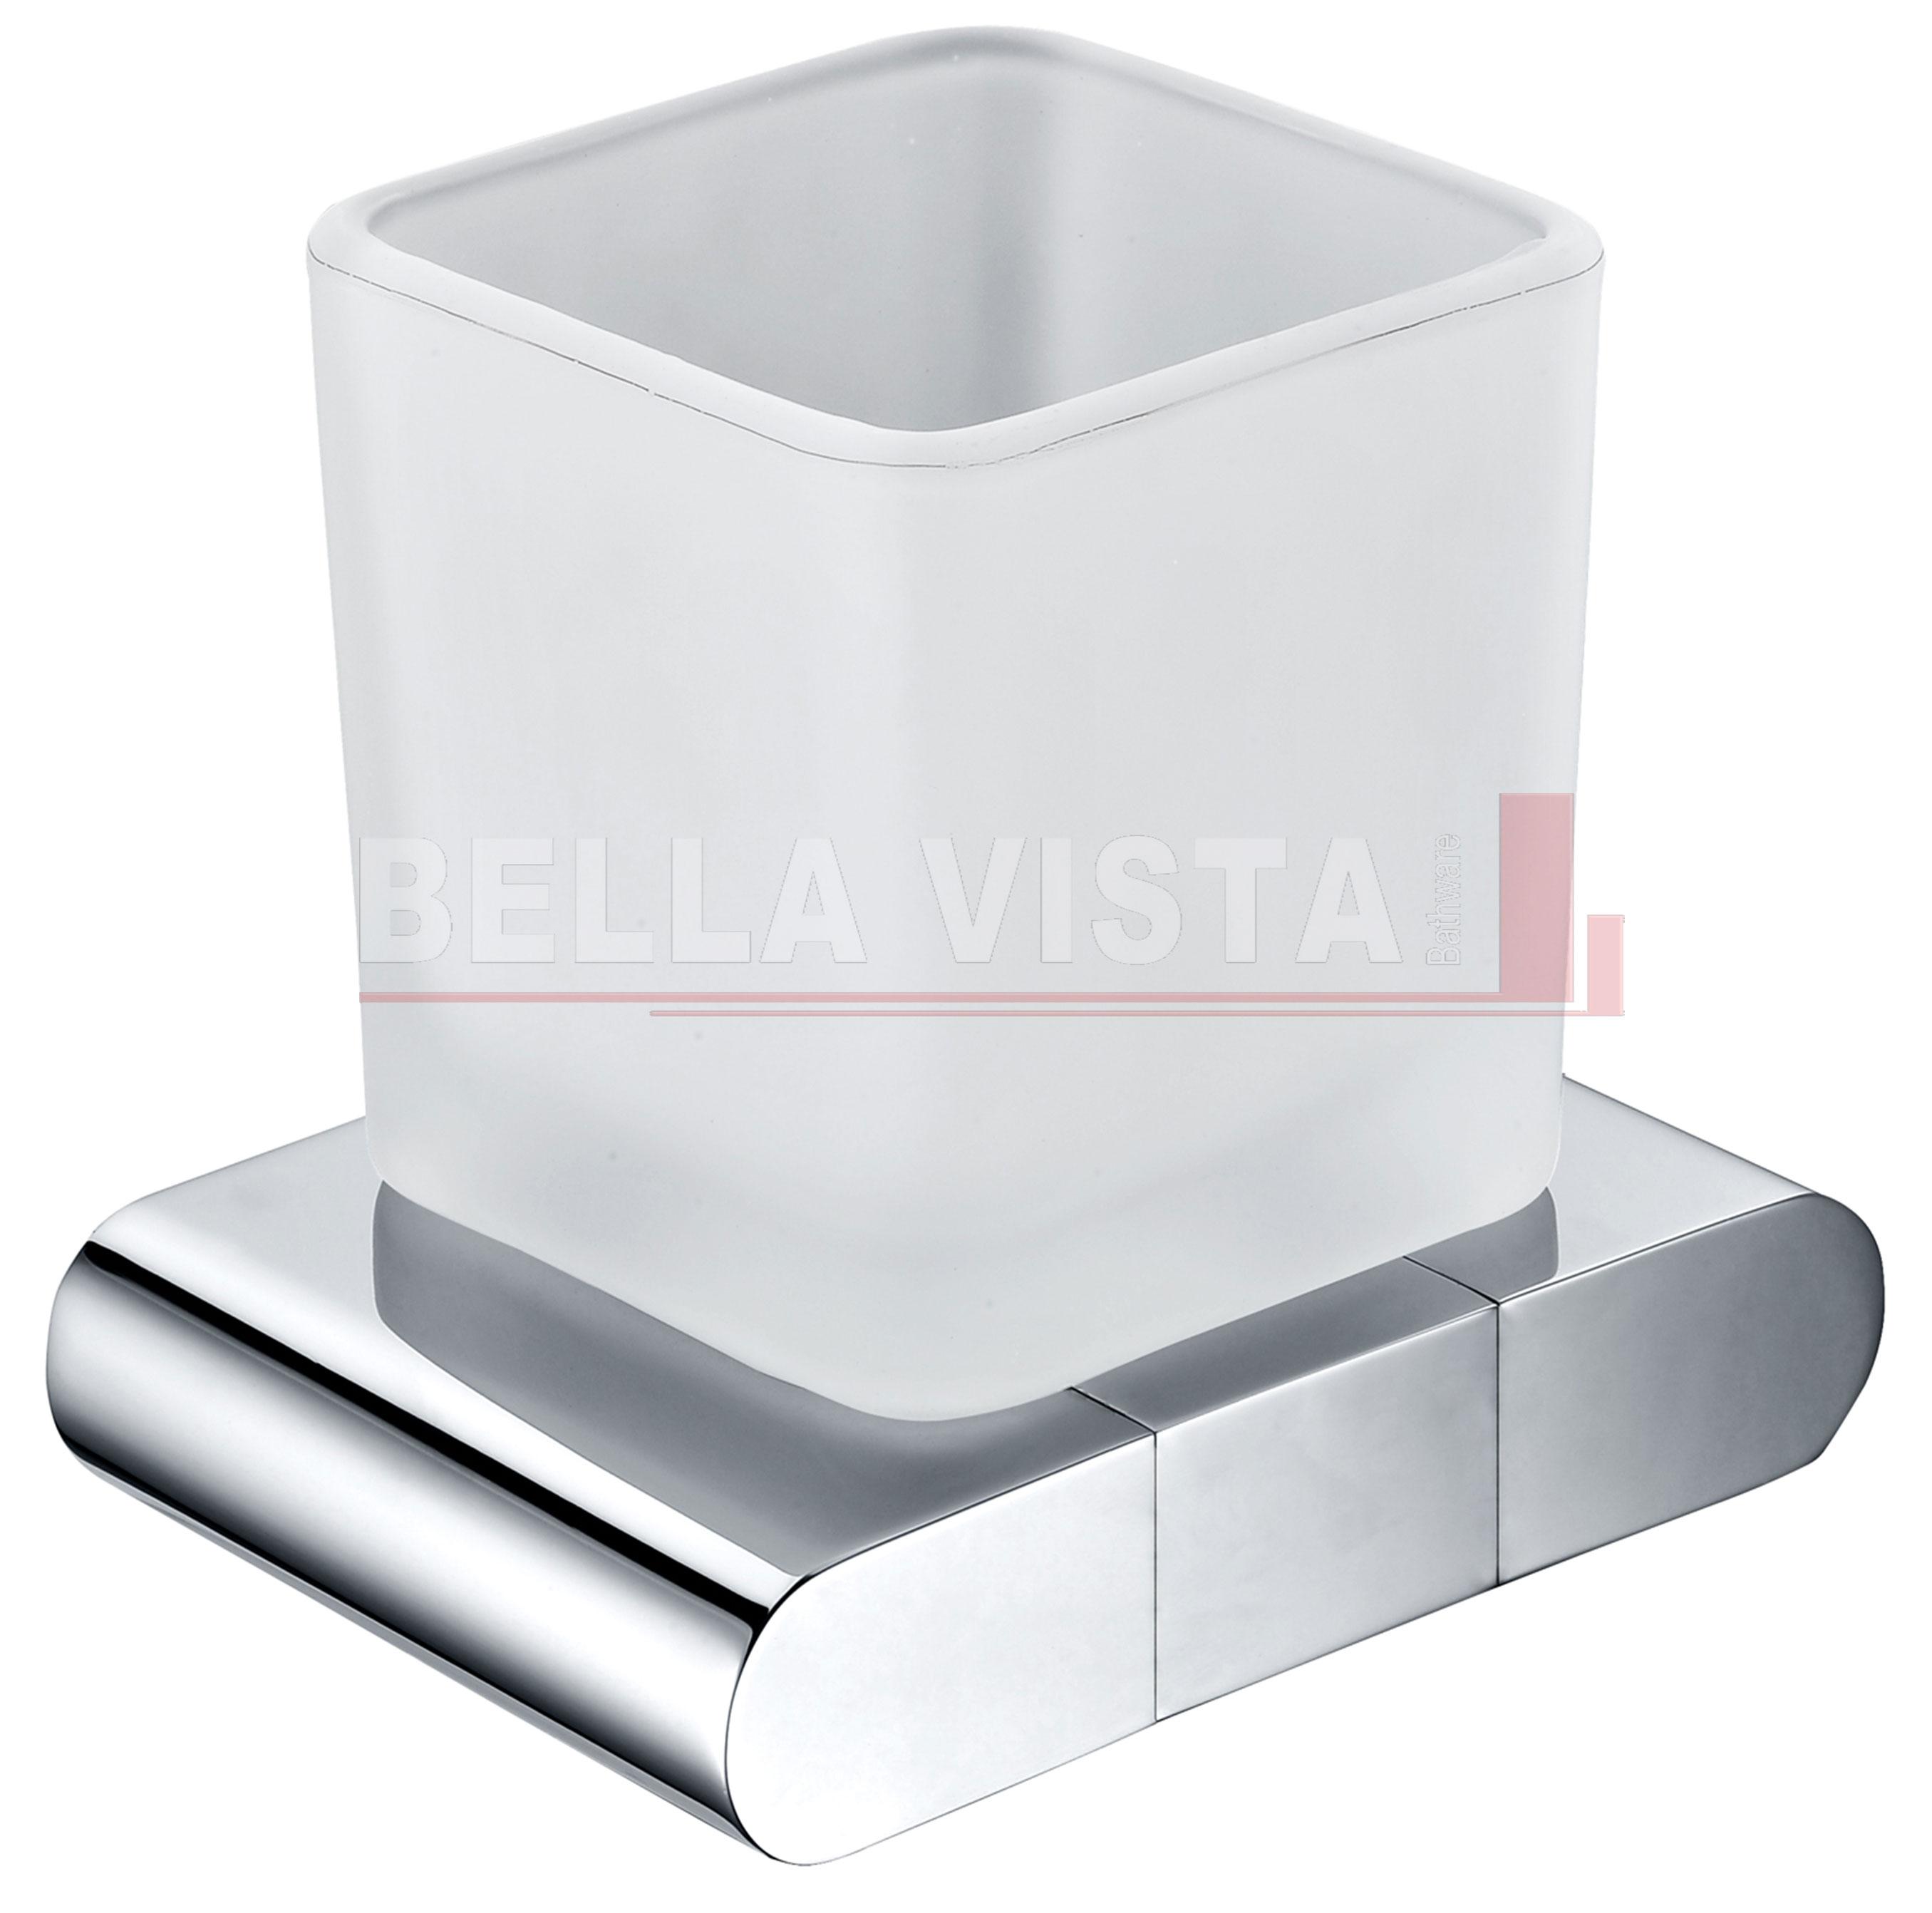 Bella Vista Bathware bellav1216 on Pinterest